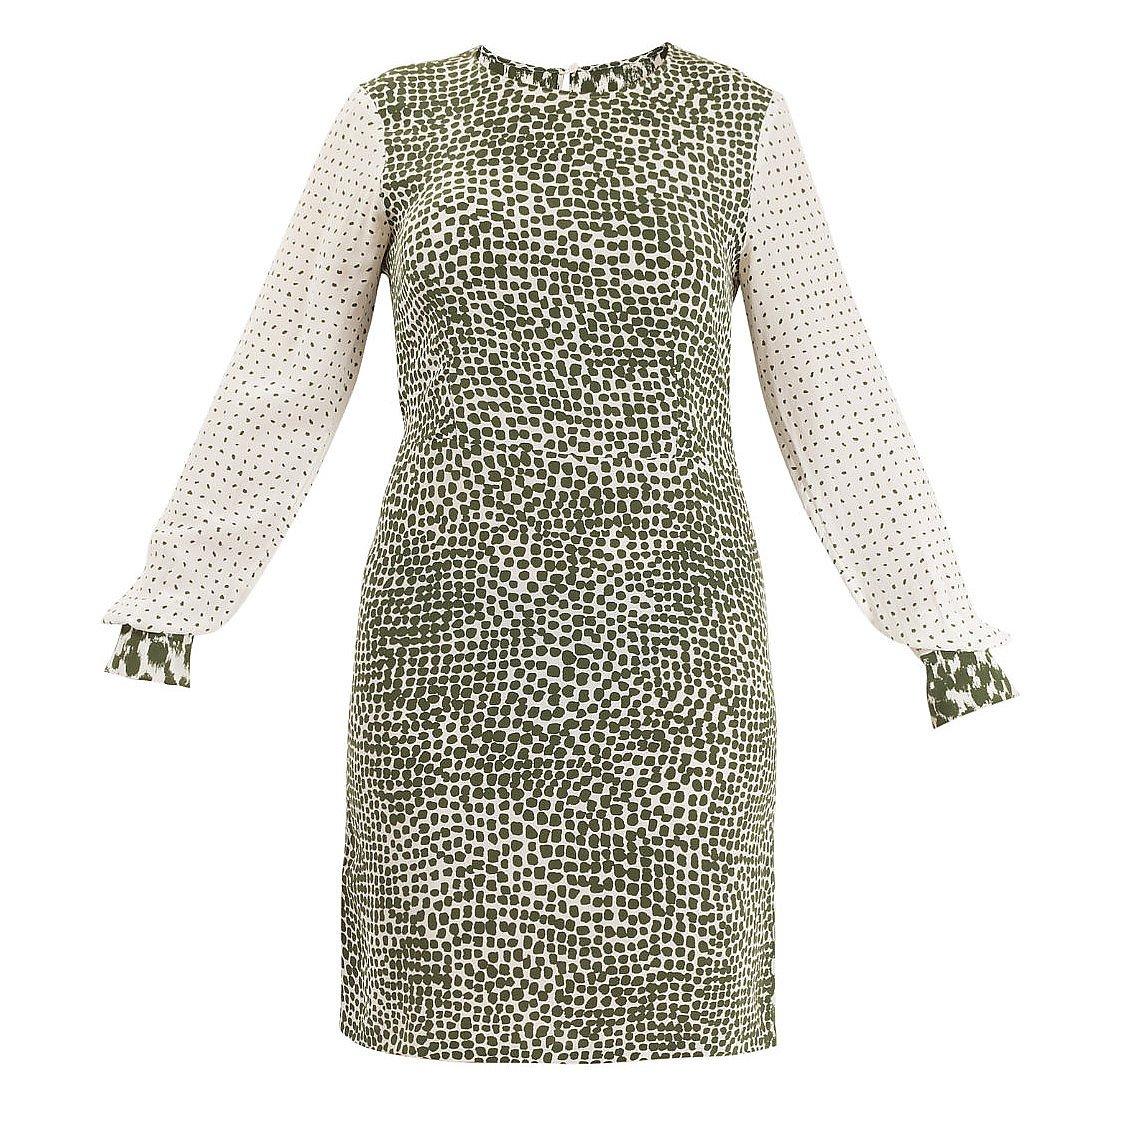 Stella McCartney Contrast Print Silk Dress